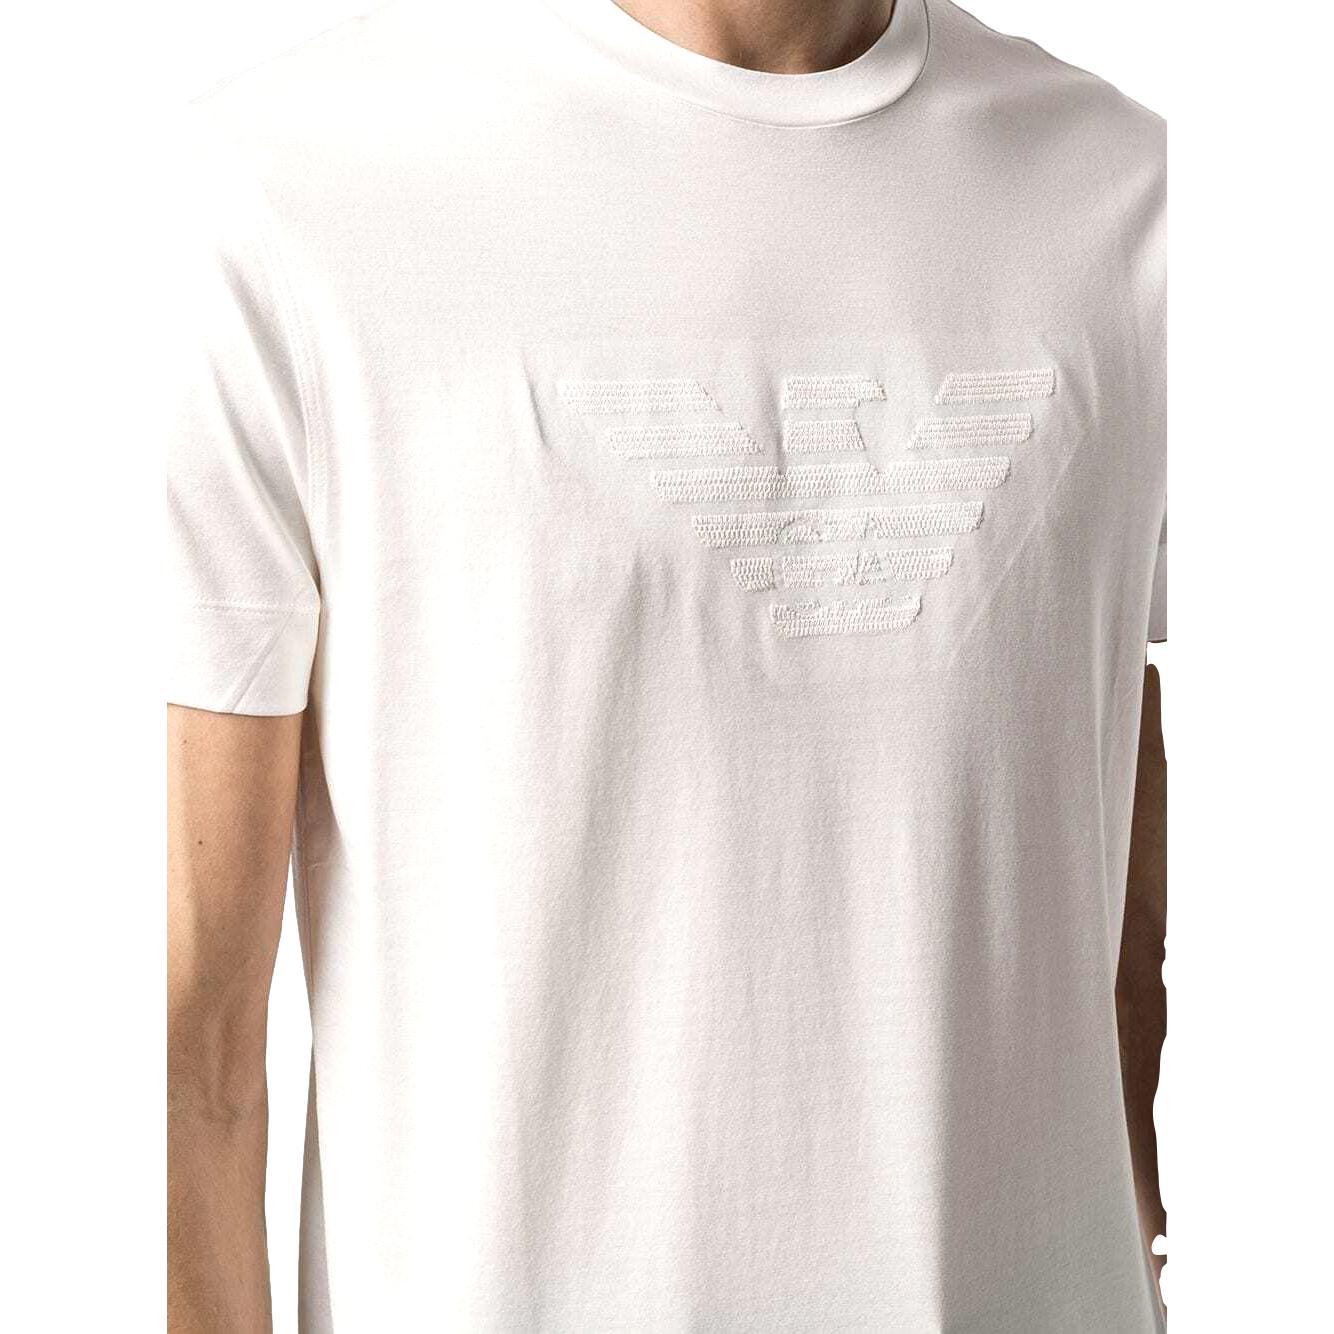 embroidered-logo cotton T-Shirt EMPORIO ARMANI |  | 3K1TR5 1JUVZ0162